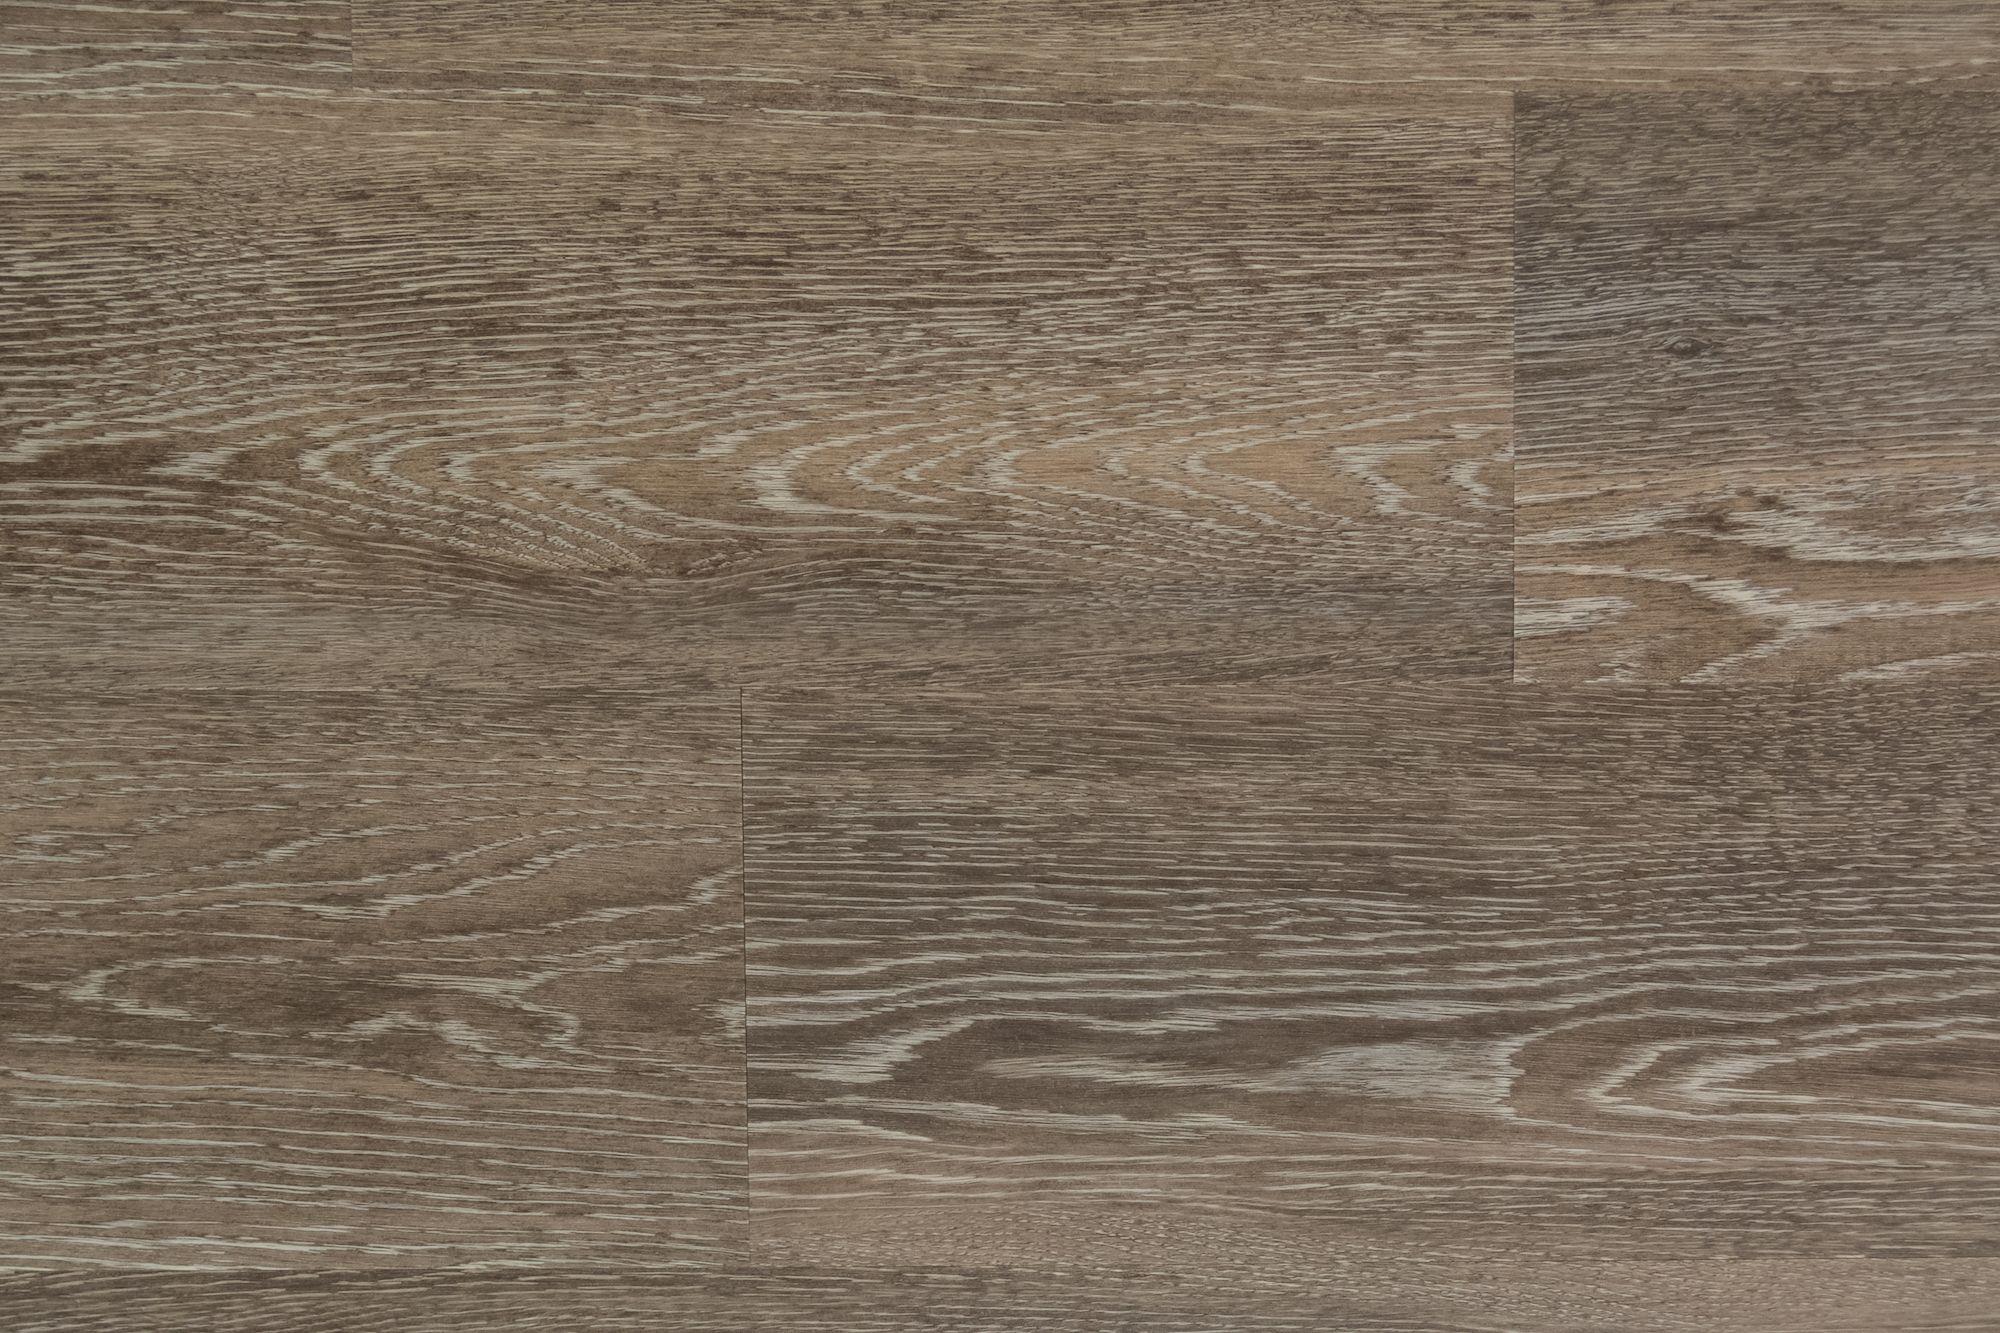 636 674 Enstor Flooring Luxury Vinyl Tile Pvc Flooring